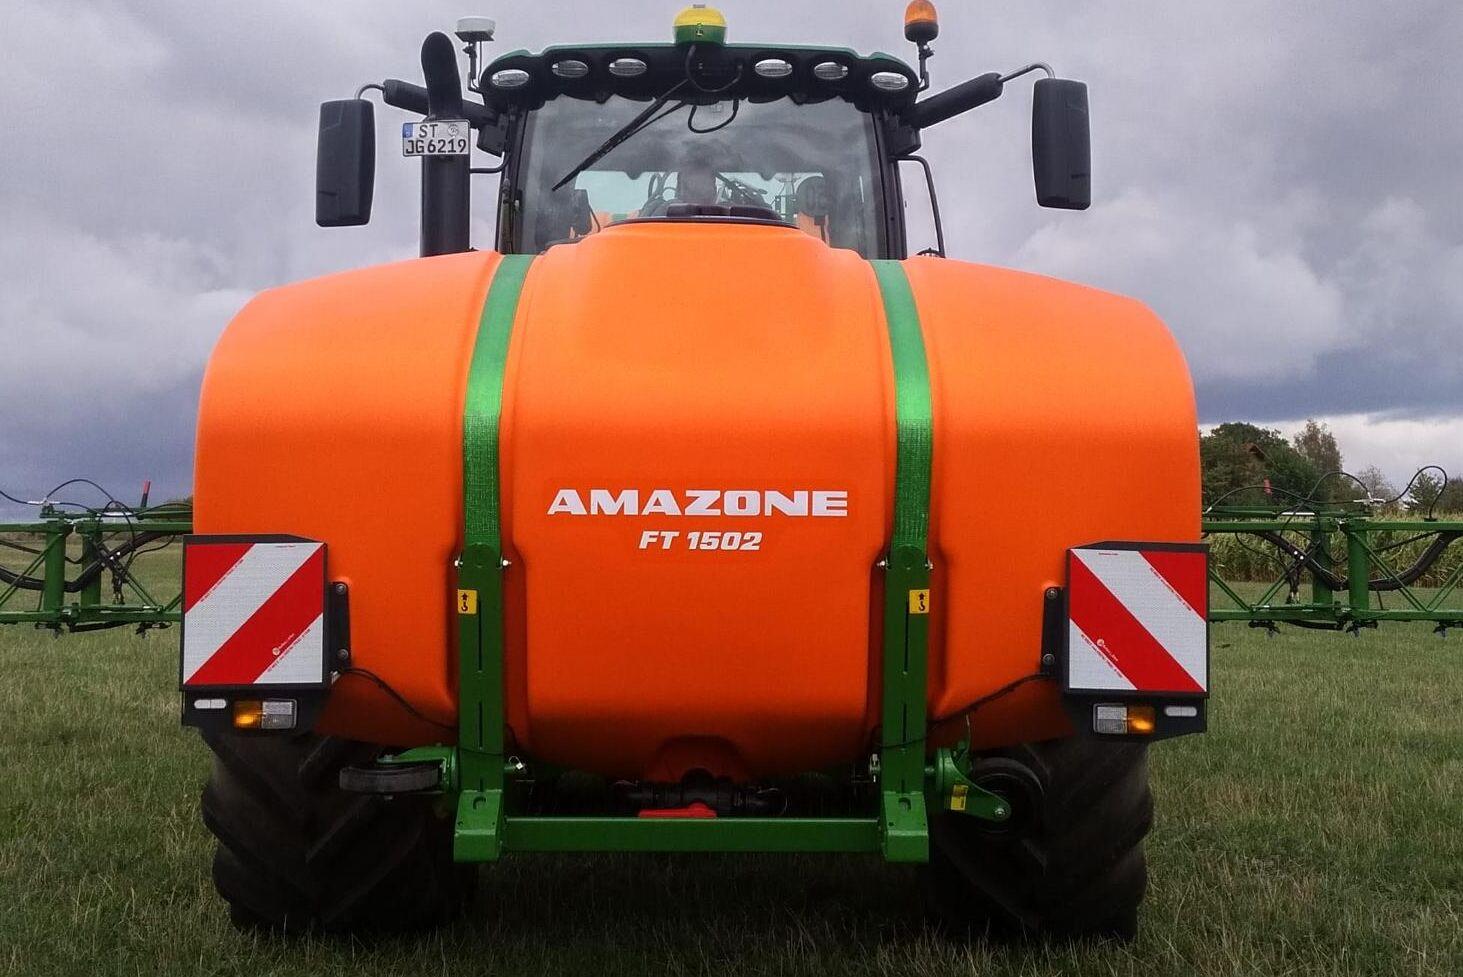 Amazones FT 1502 rymmer 1 500 liter.